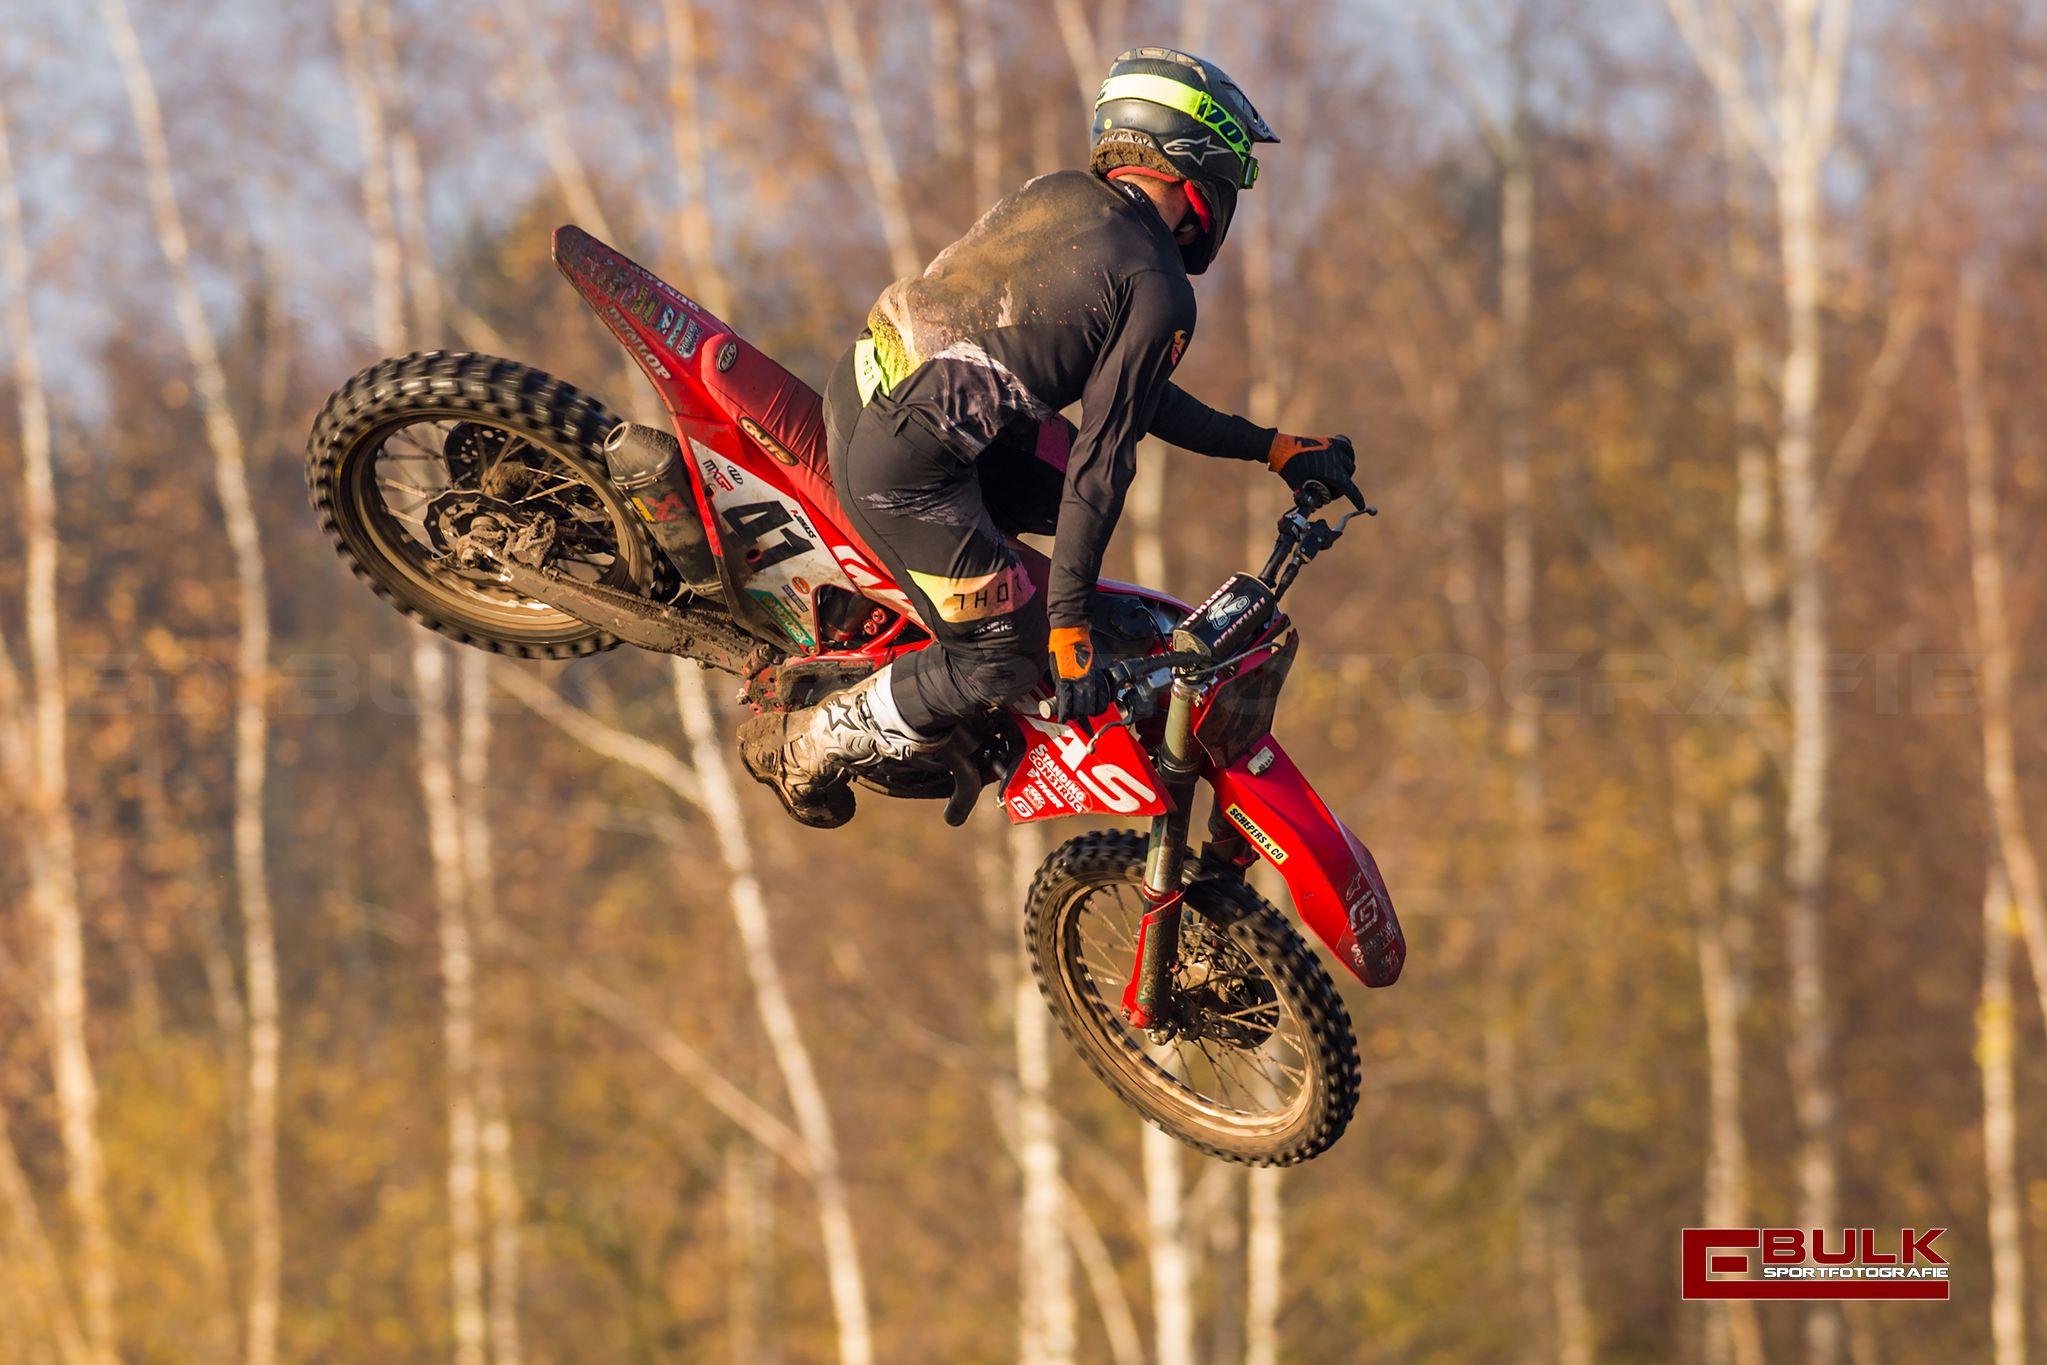 eebs2206-ed_bulk_sportfotografie